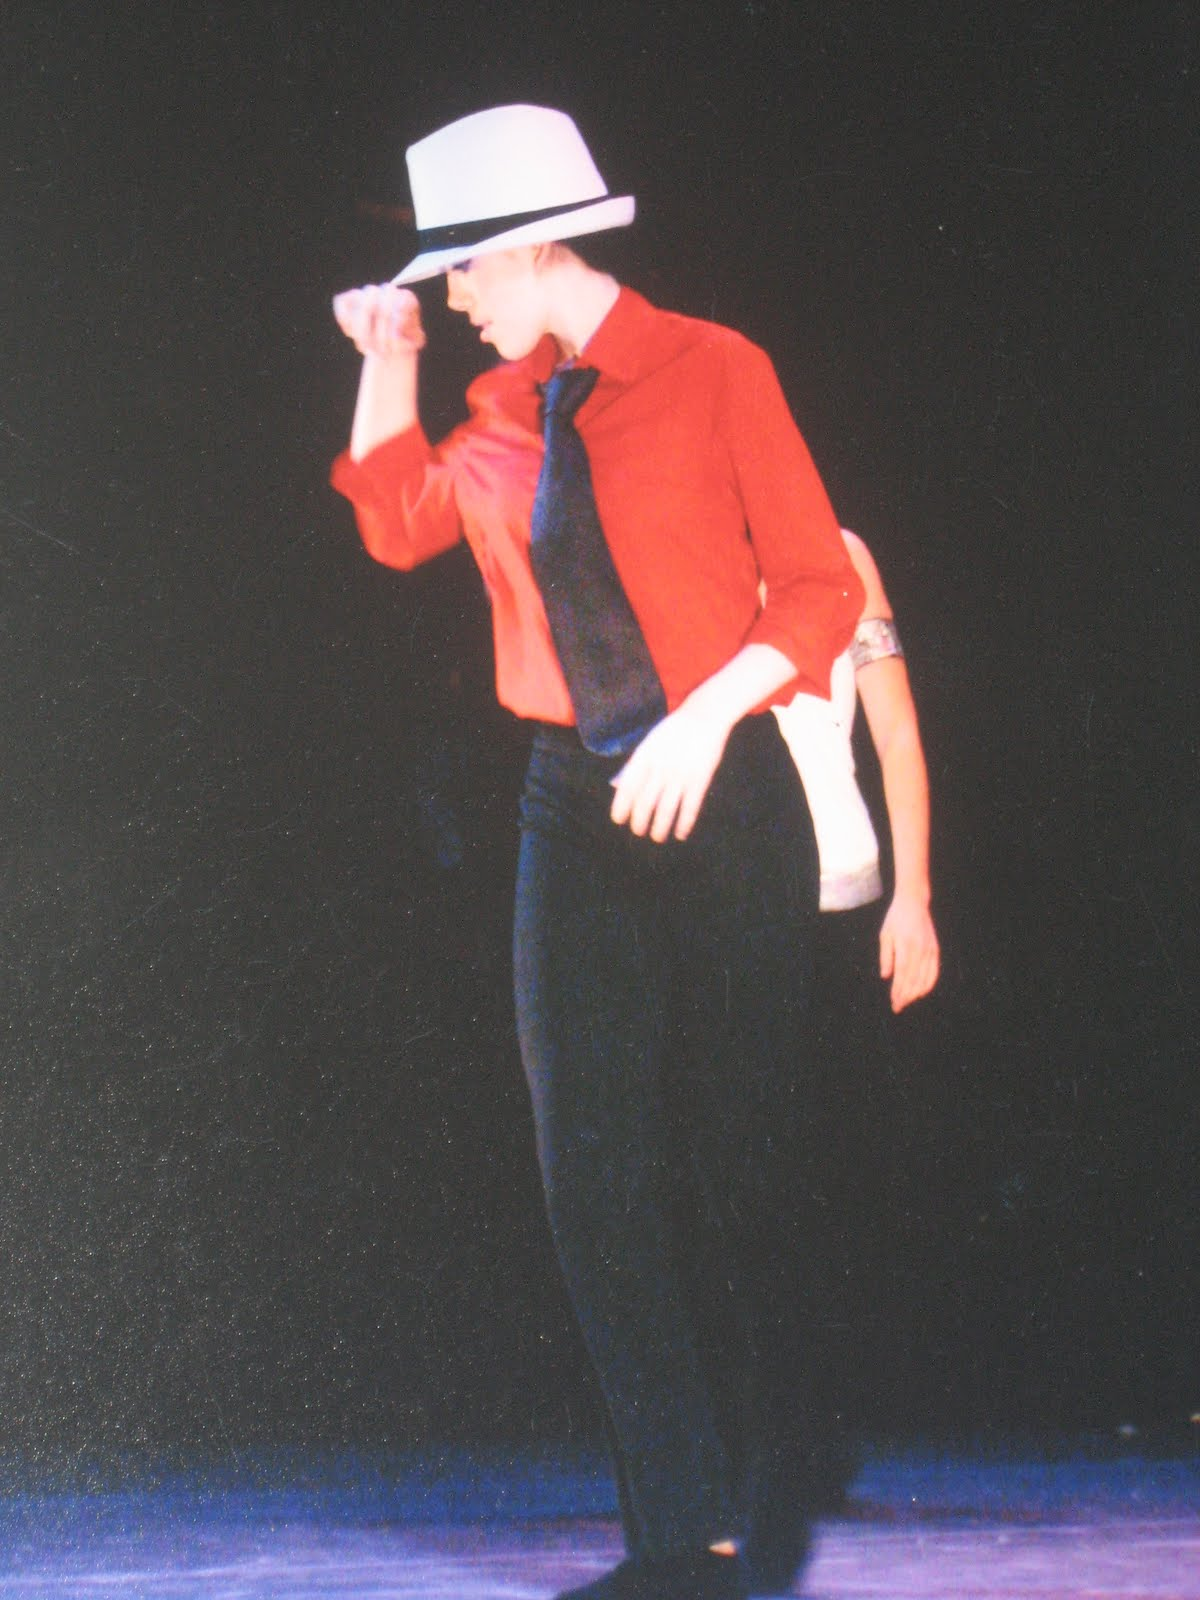 http://3.bp.blogspot.com/_edCjm5I2cKI/Sw_r9qT3J6I/AAAAAAAAAA4/EvzF-KPaCe4/s1600/Michael+Jackson+dance.JPG